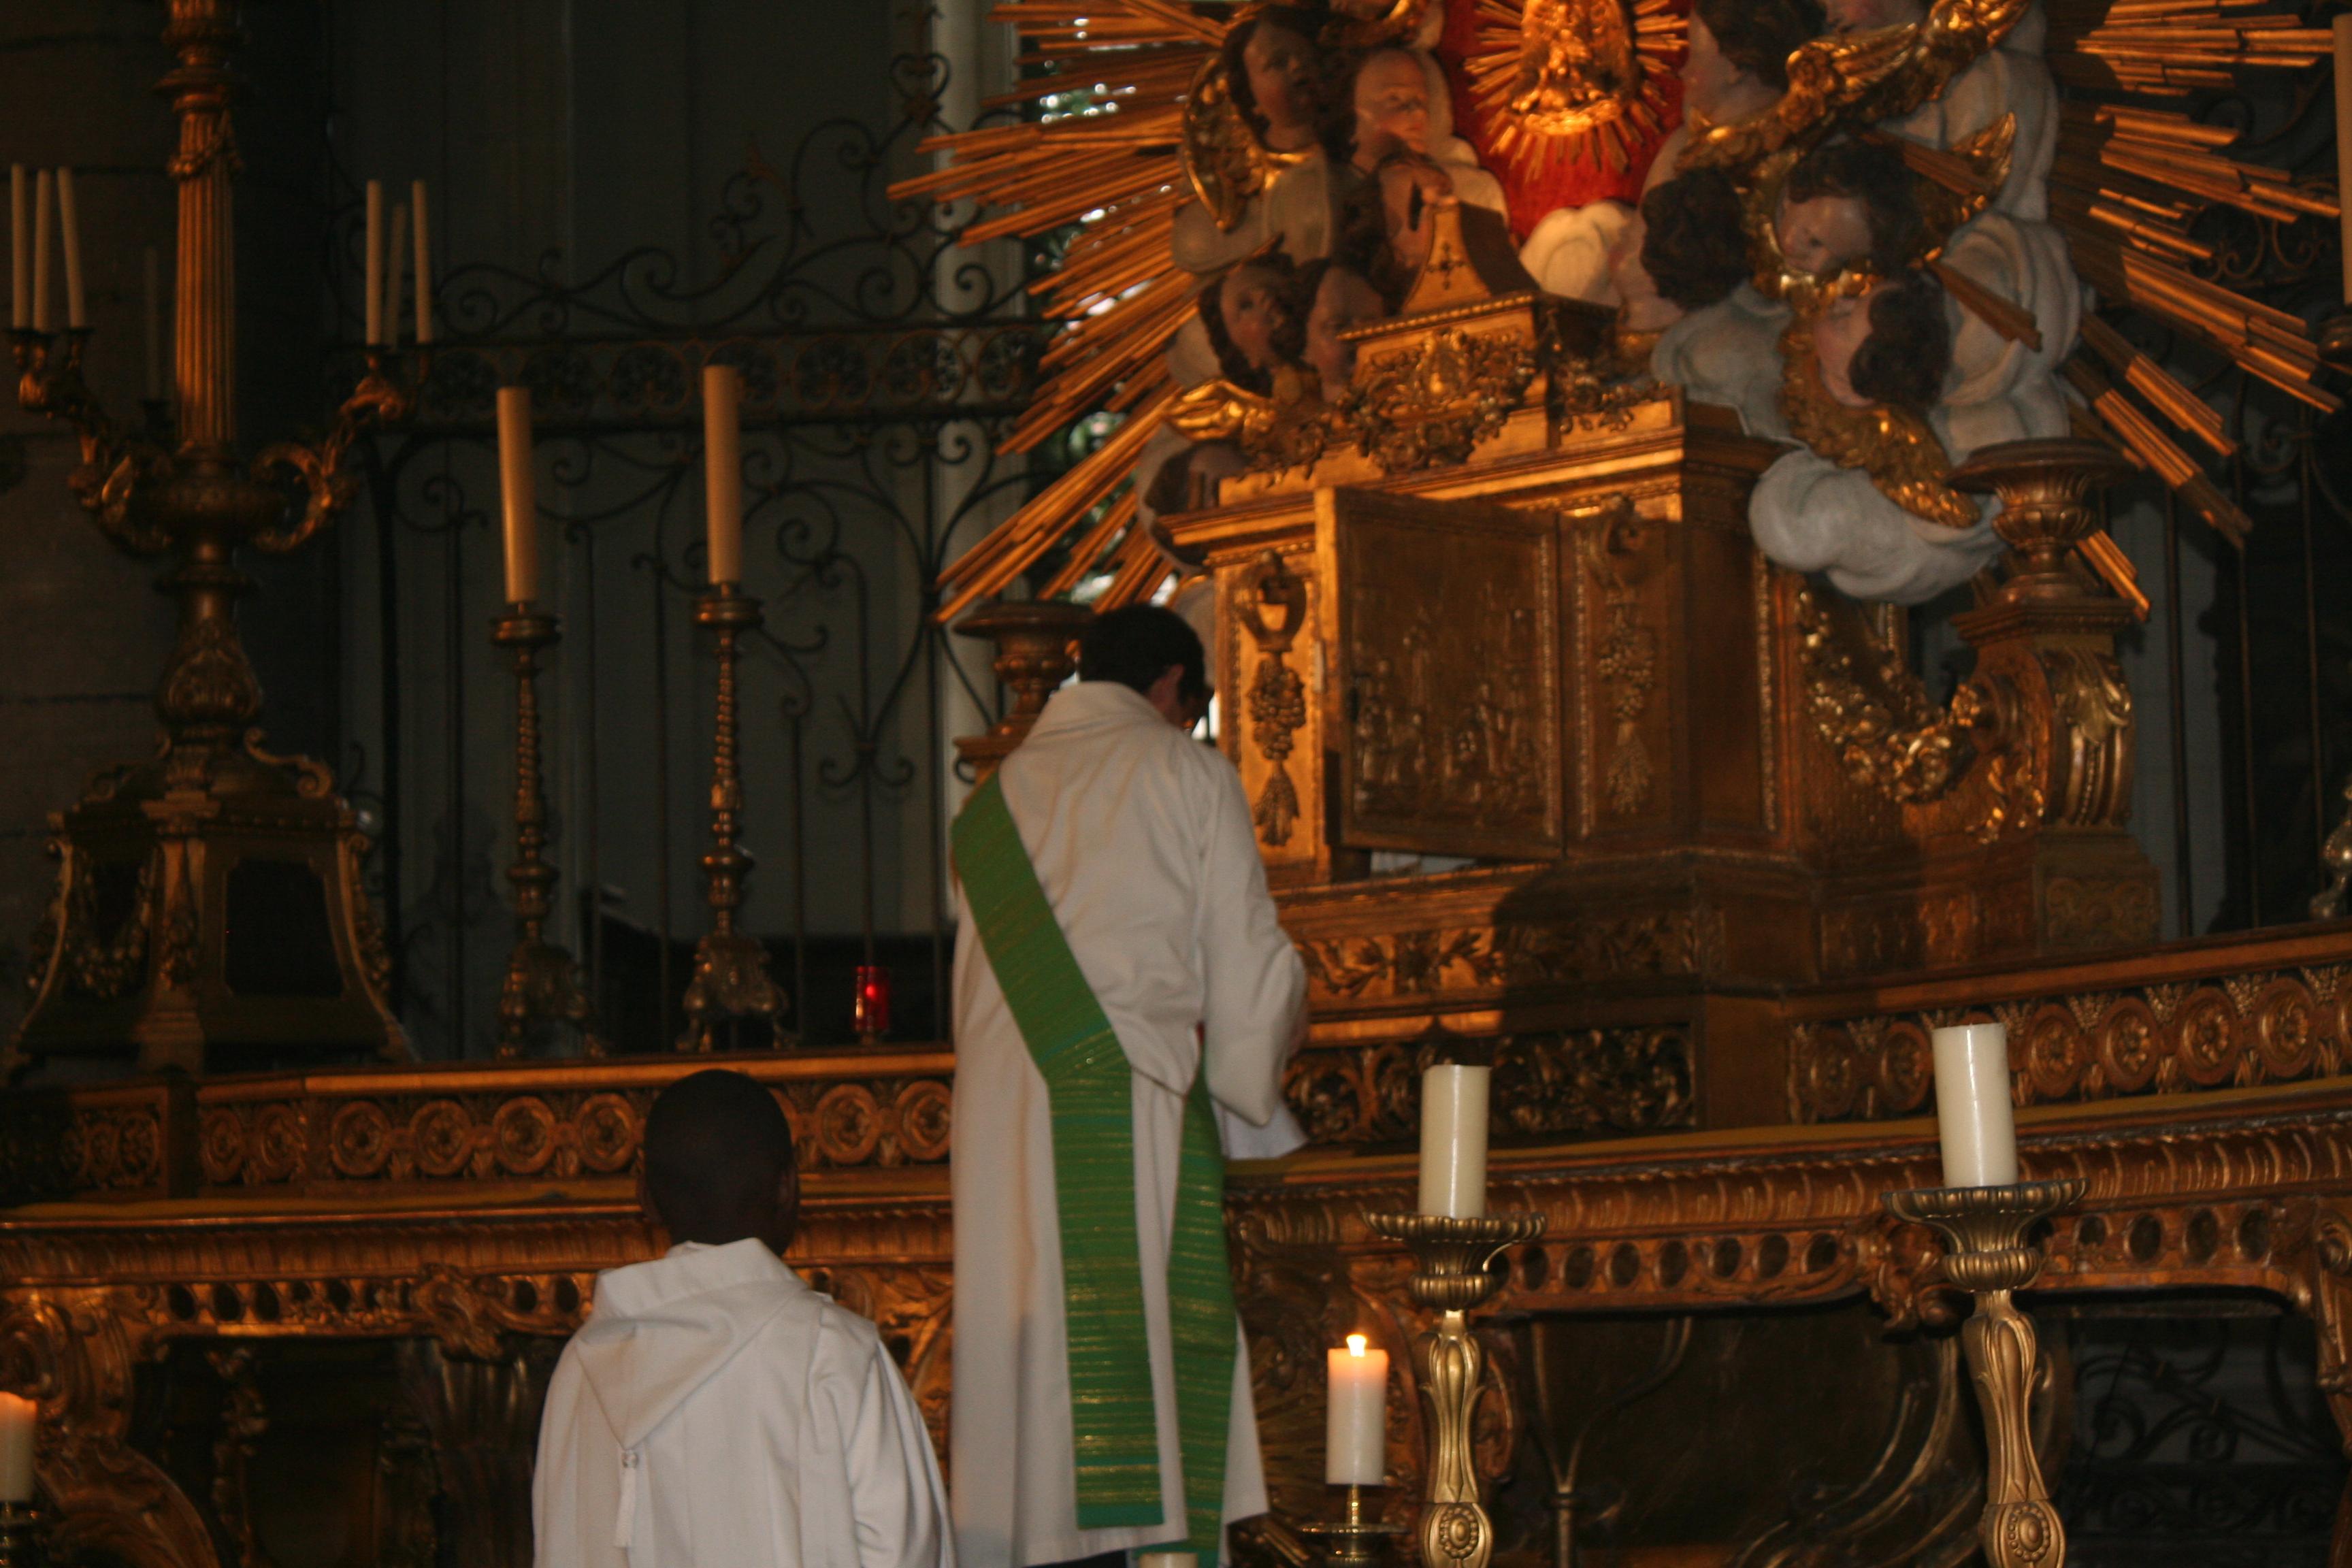 Matthieu Bobin au tabernacle